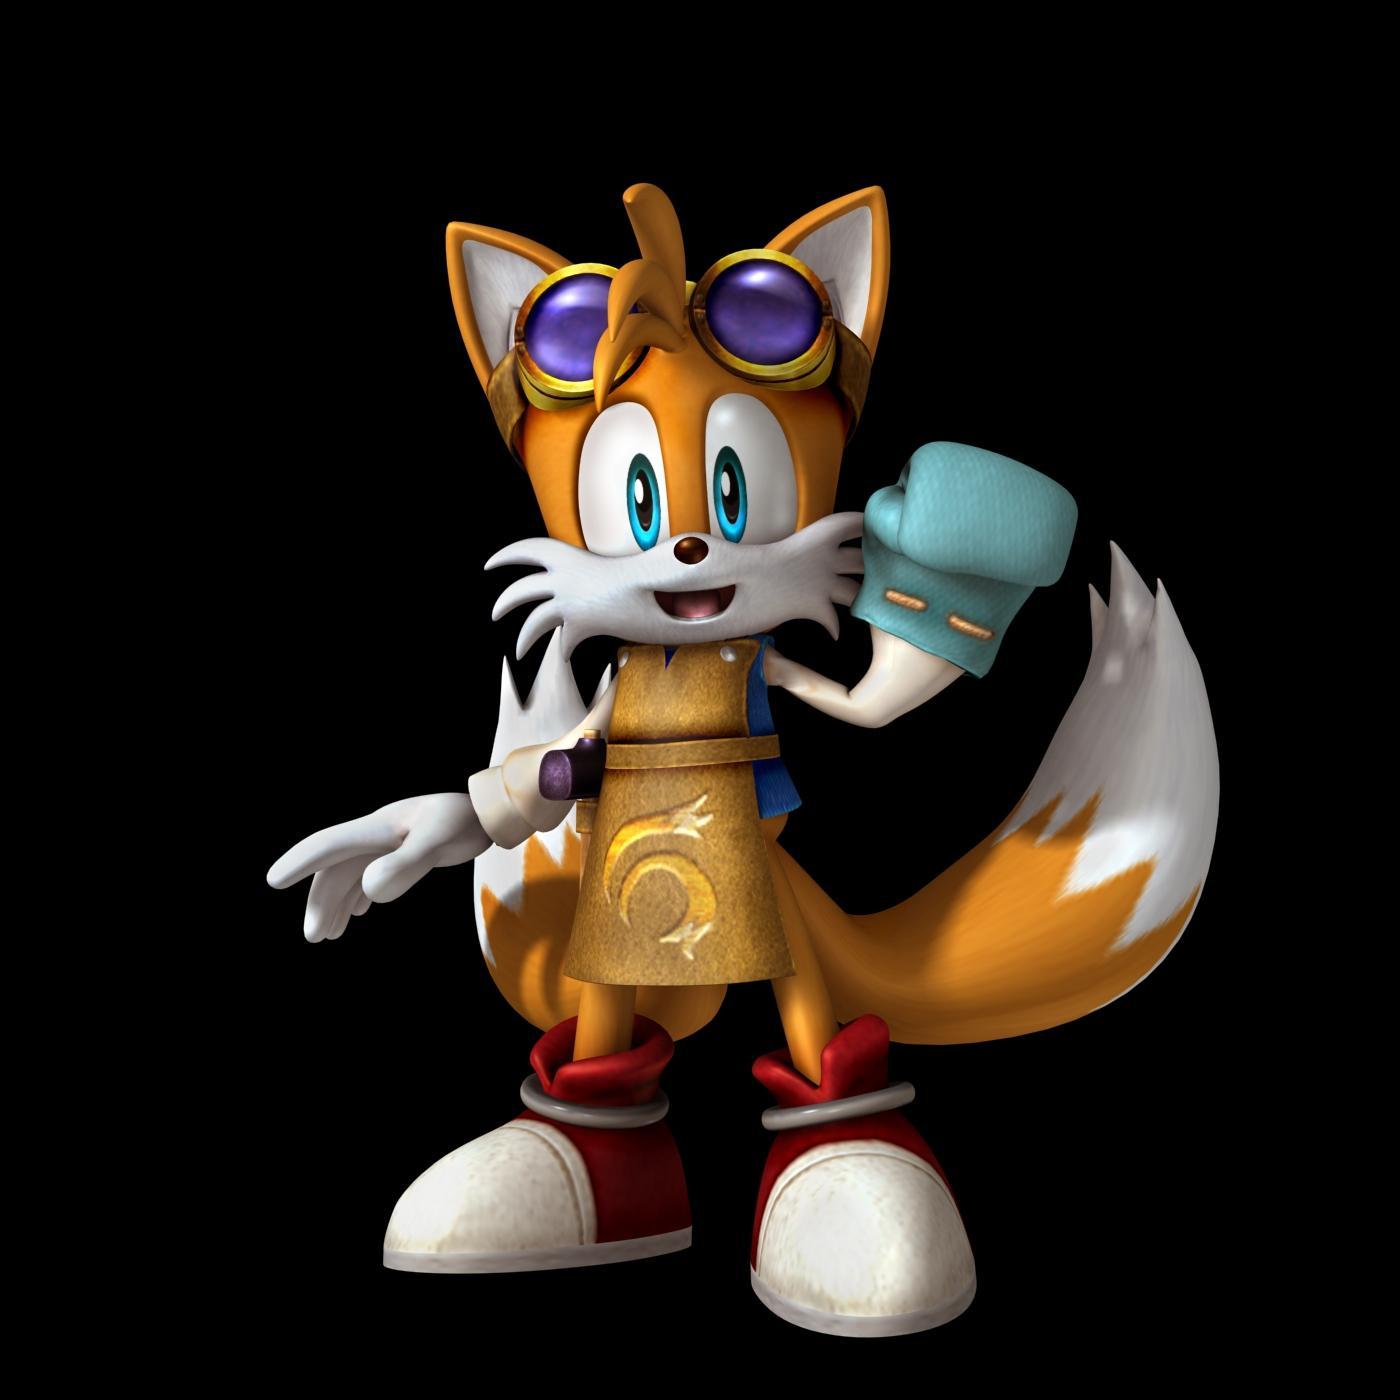 Bild - Tails (Sonic und der schwarze Ritter).jpg | Sonic Fan Werke ...